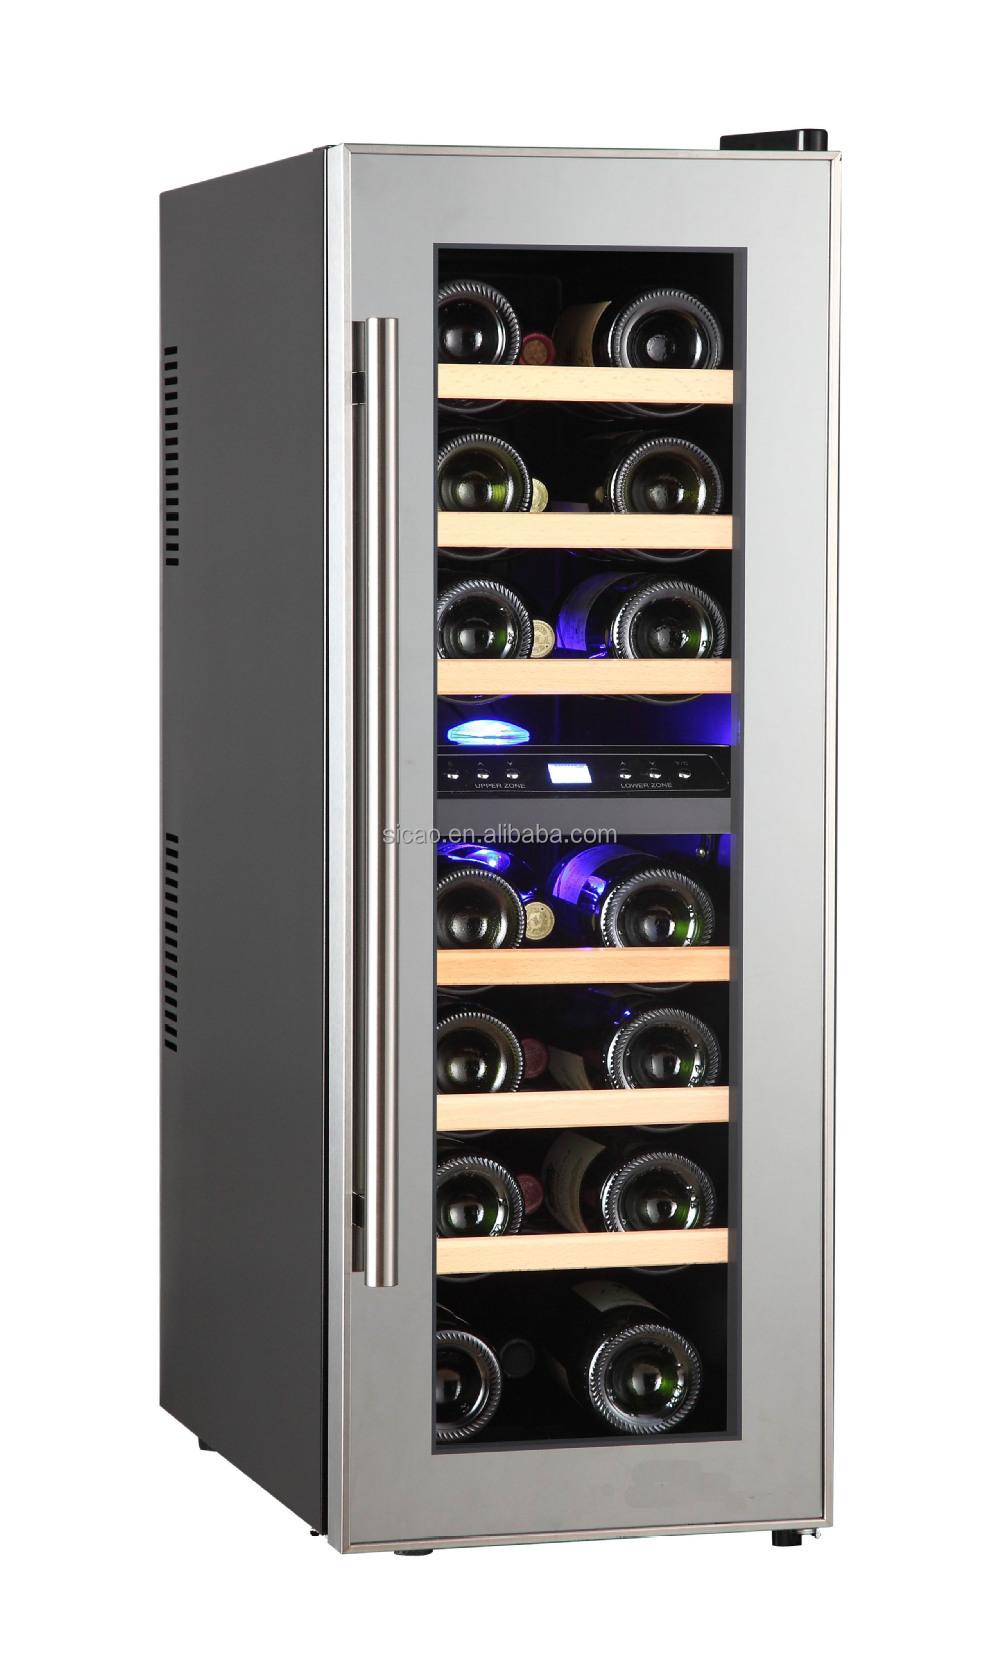 Glass Door Mini Bar Fridge Showcase Refrigerator,Slim Wine Cabinet ...